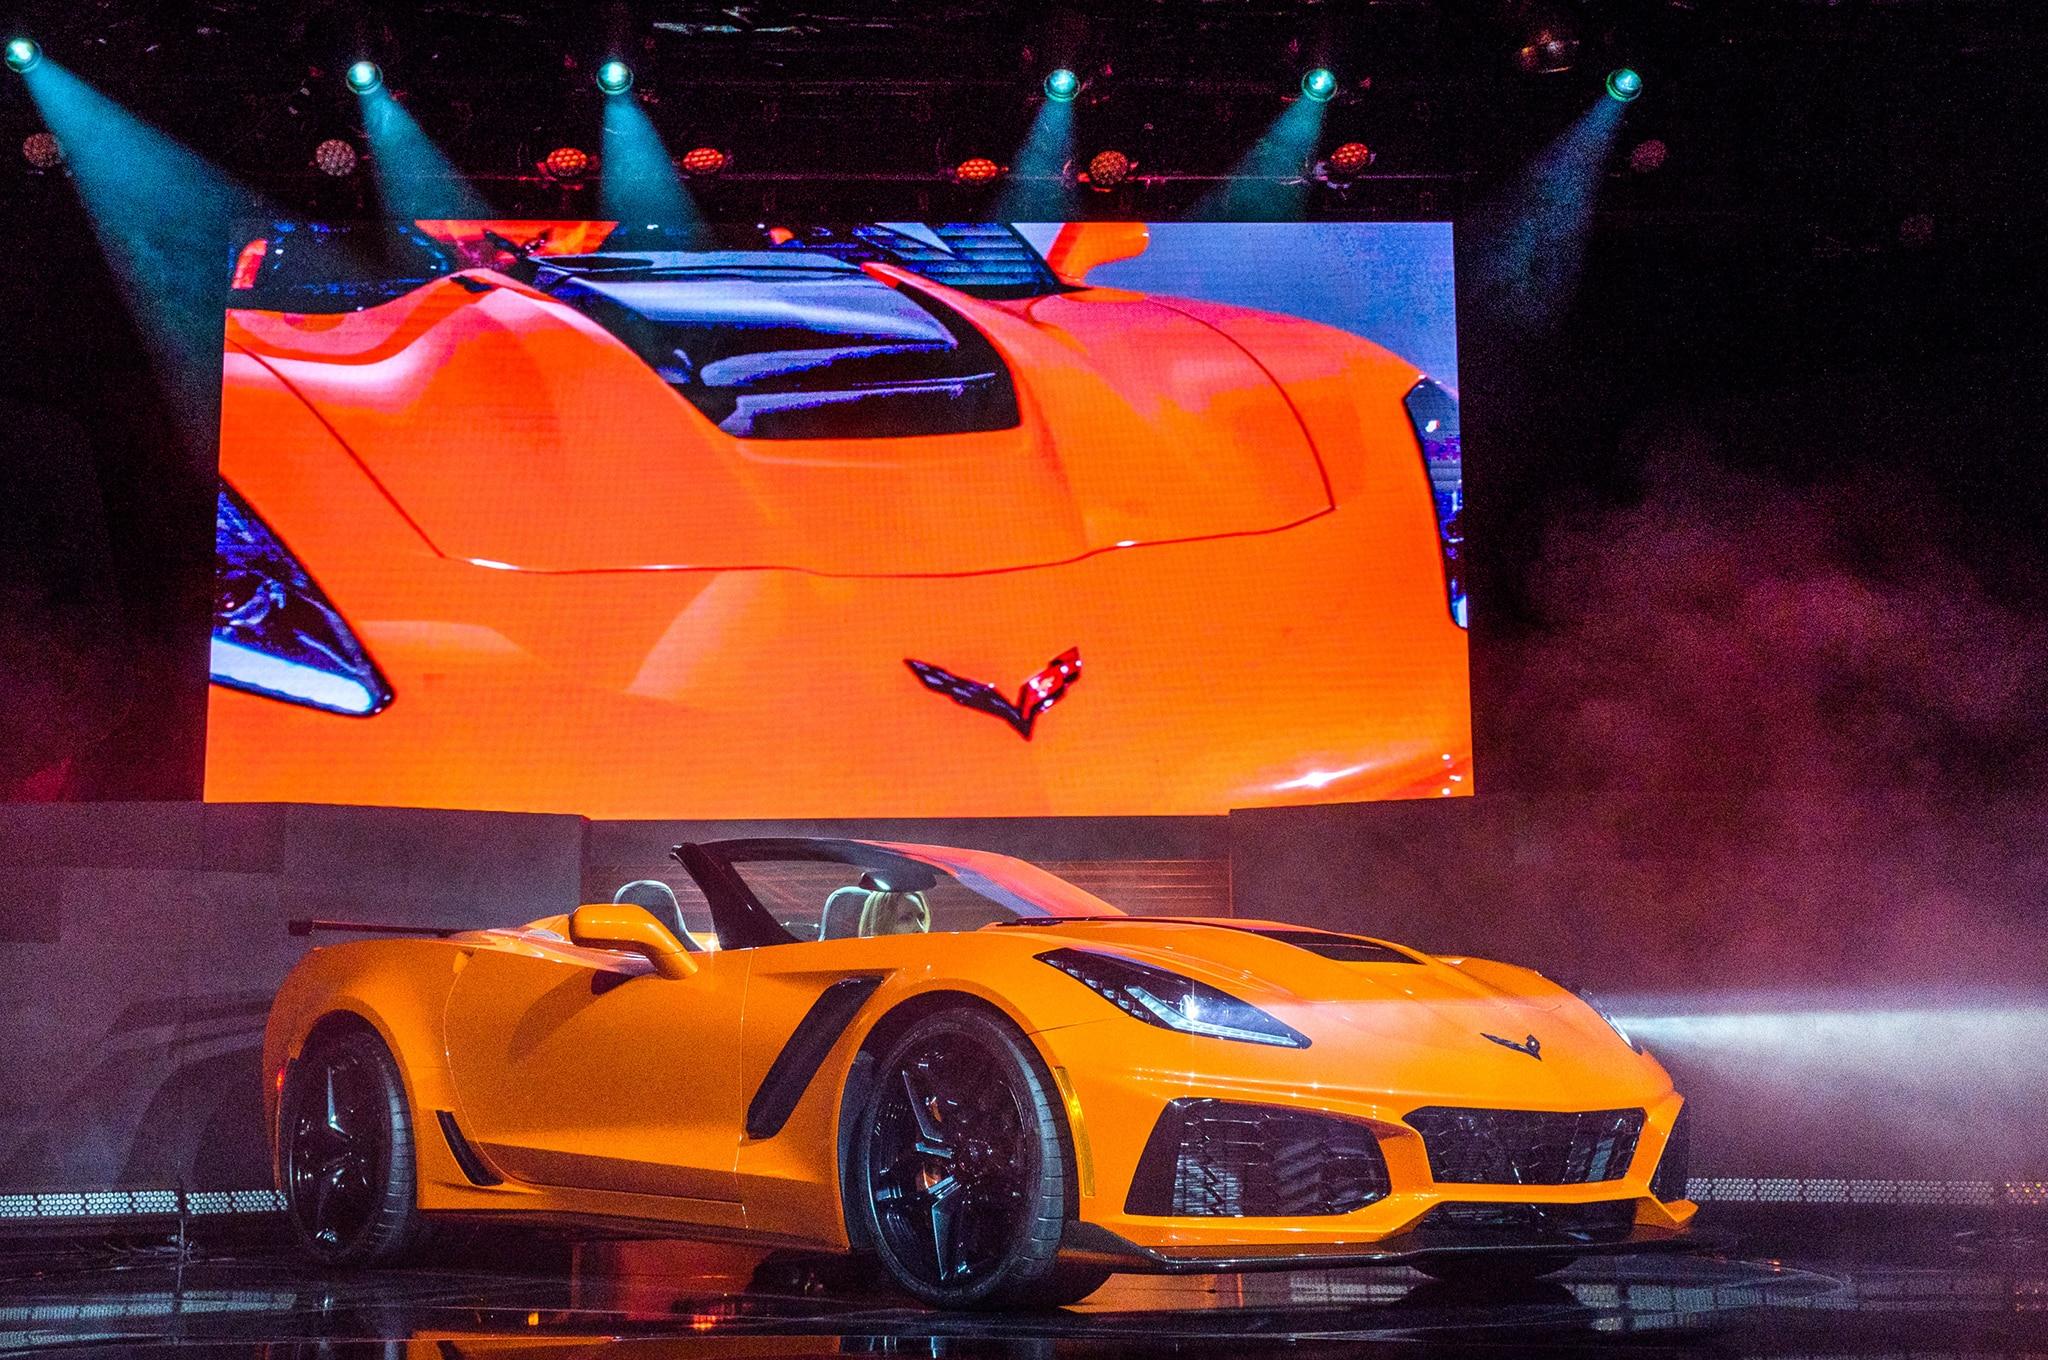 2019 Chevrolet Corvette ZR1 Front Three Quarter